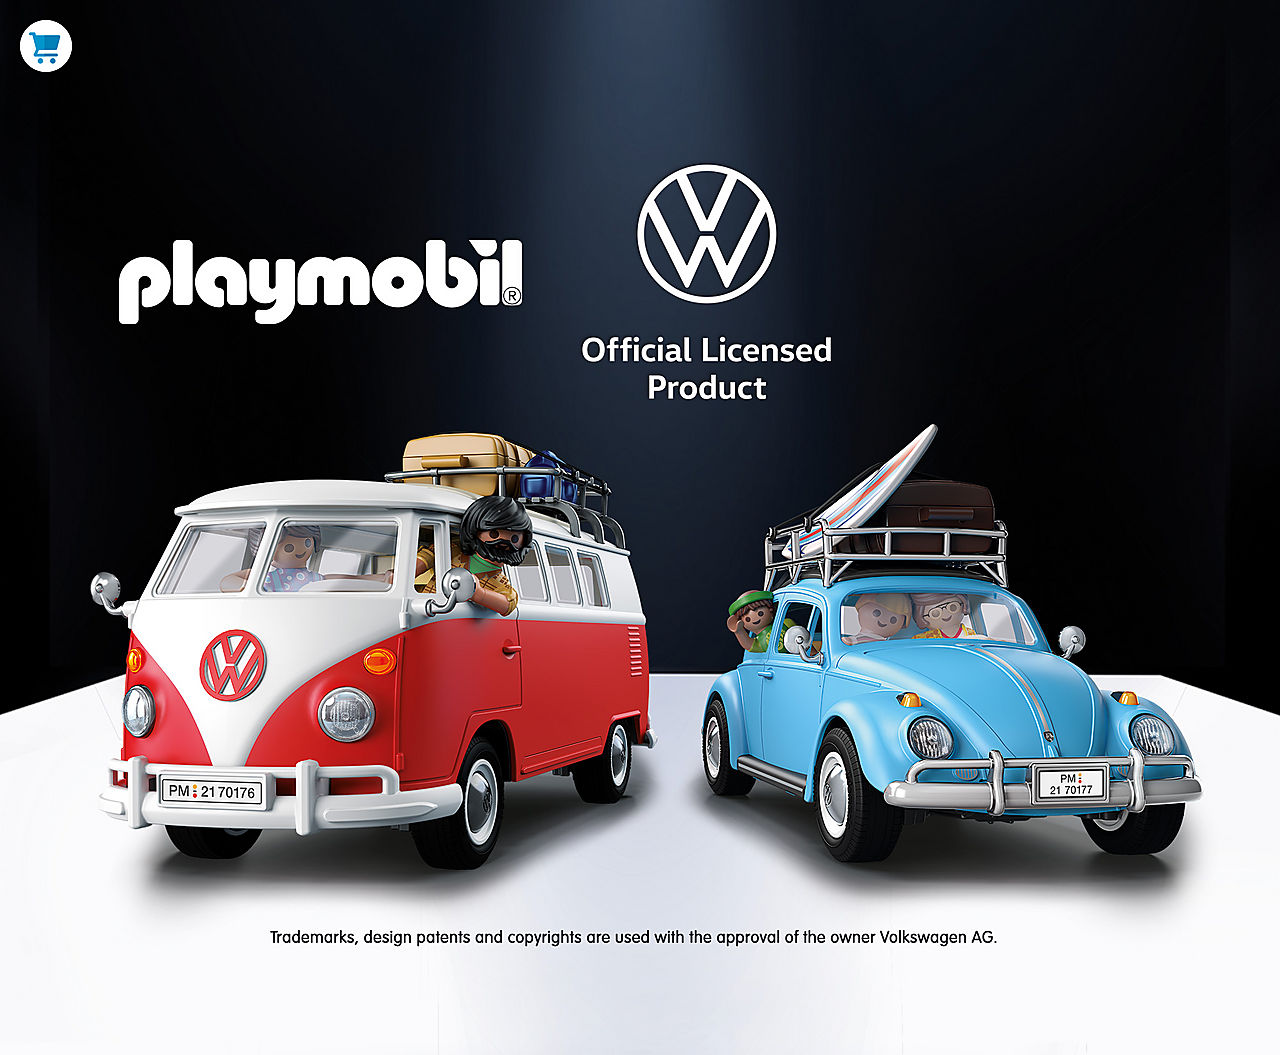 Discover the two new Playmobil Volkswagen - 70177 Volkswagen Beetle and 70176 Volkswagen T1 Camping Bus - shop now